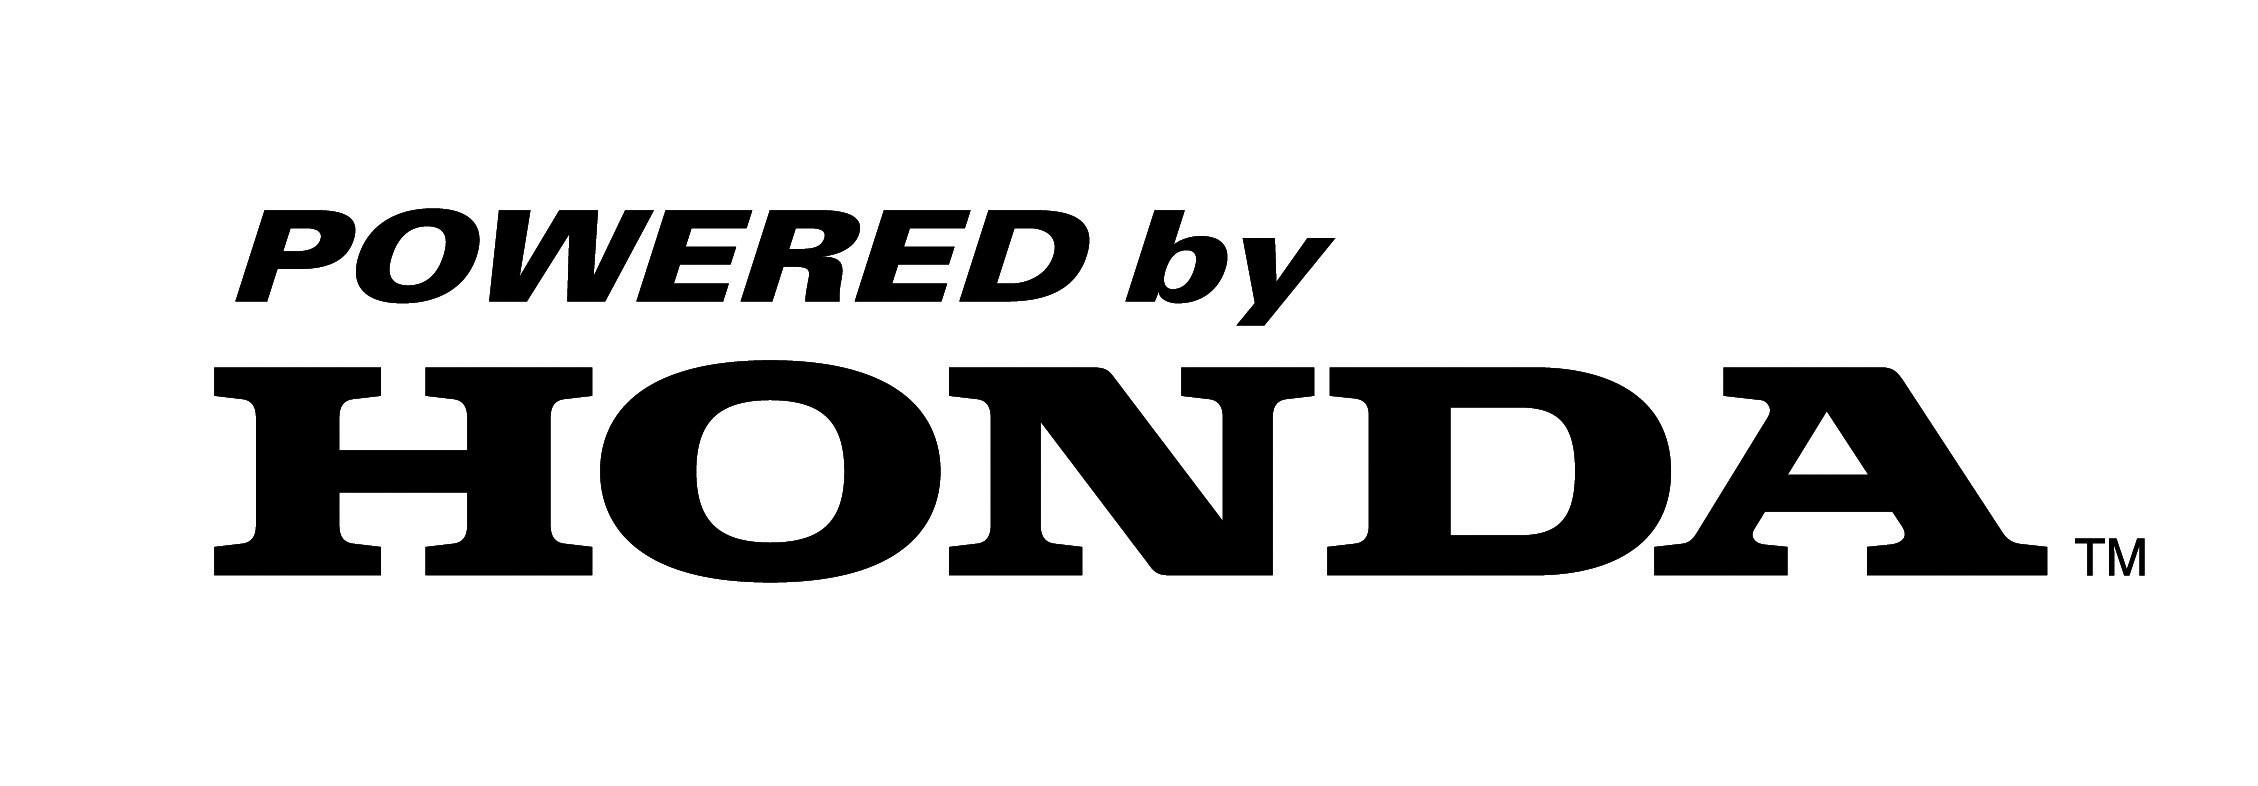 Logo-Powered-by-Honda-2006.jpg